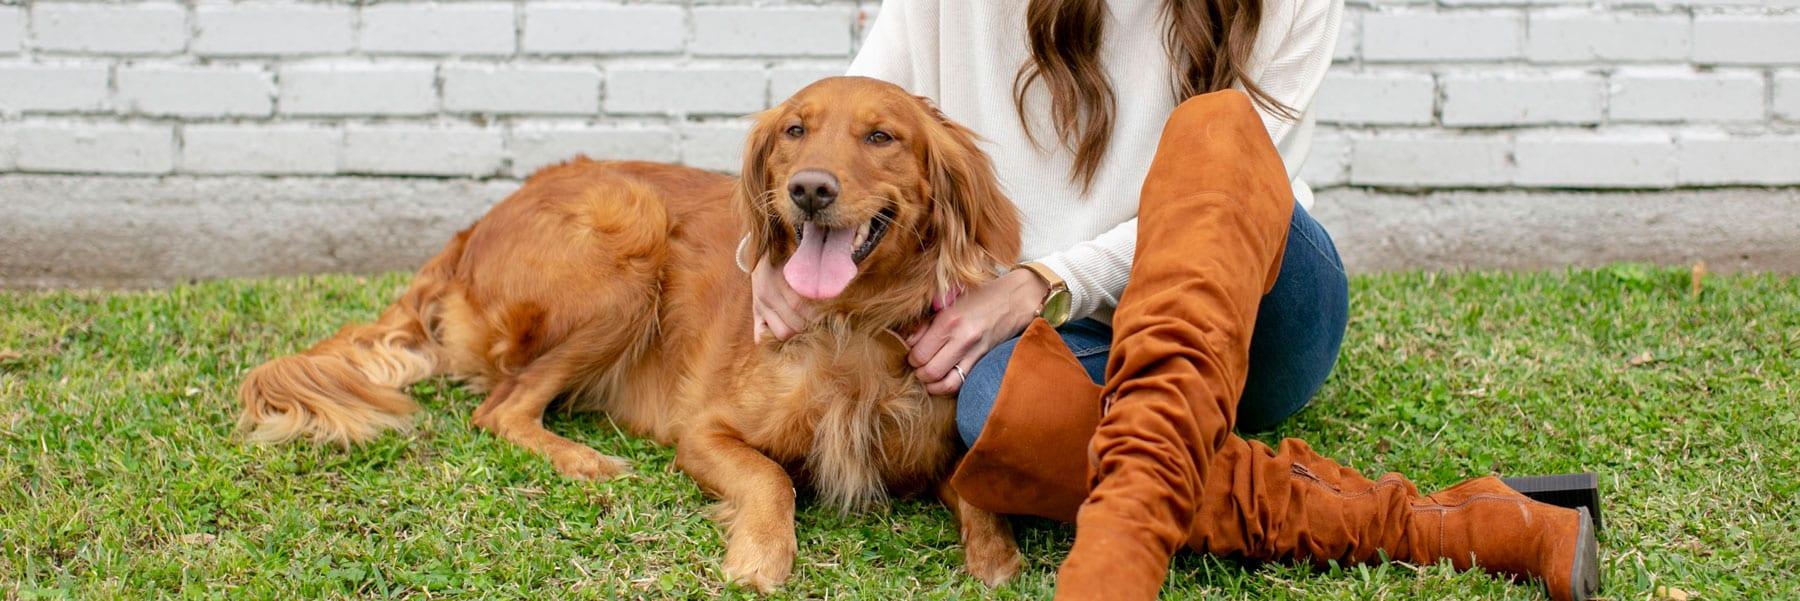 Dixie - the K9 Digital Marketing Agency Dog Companion